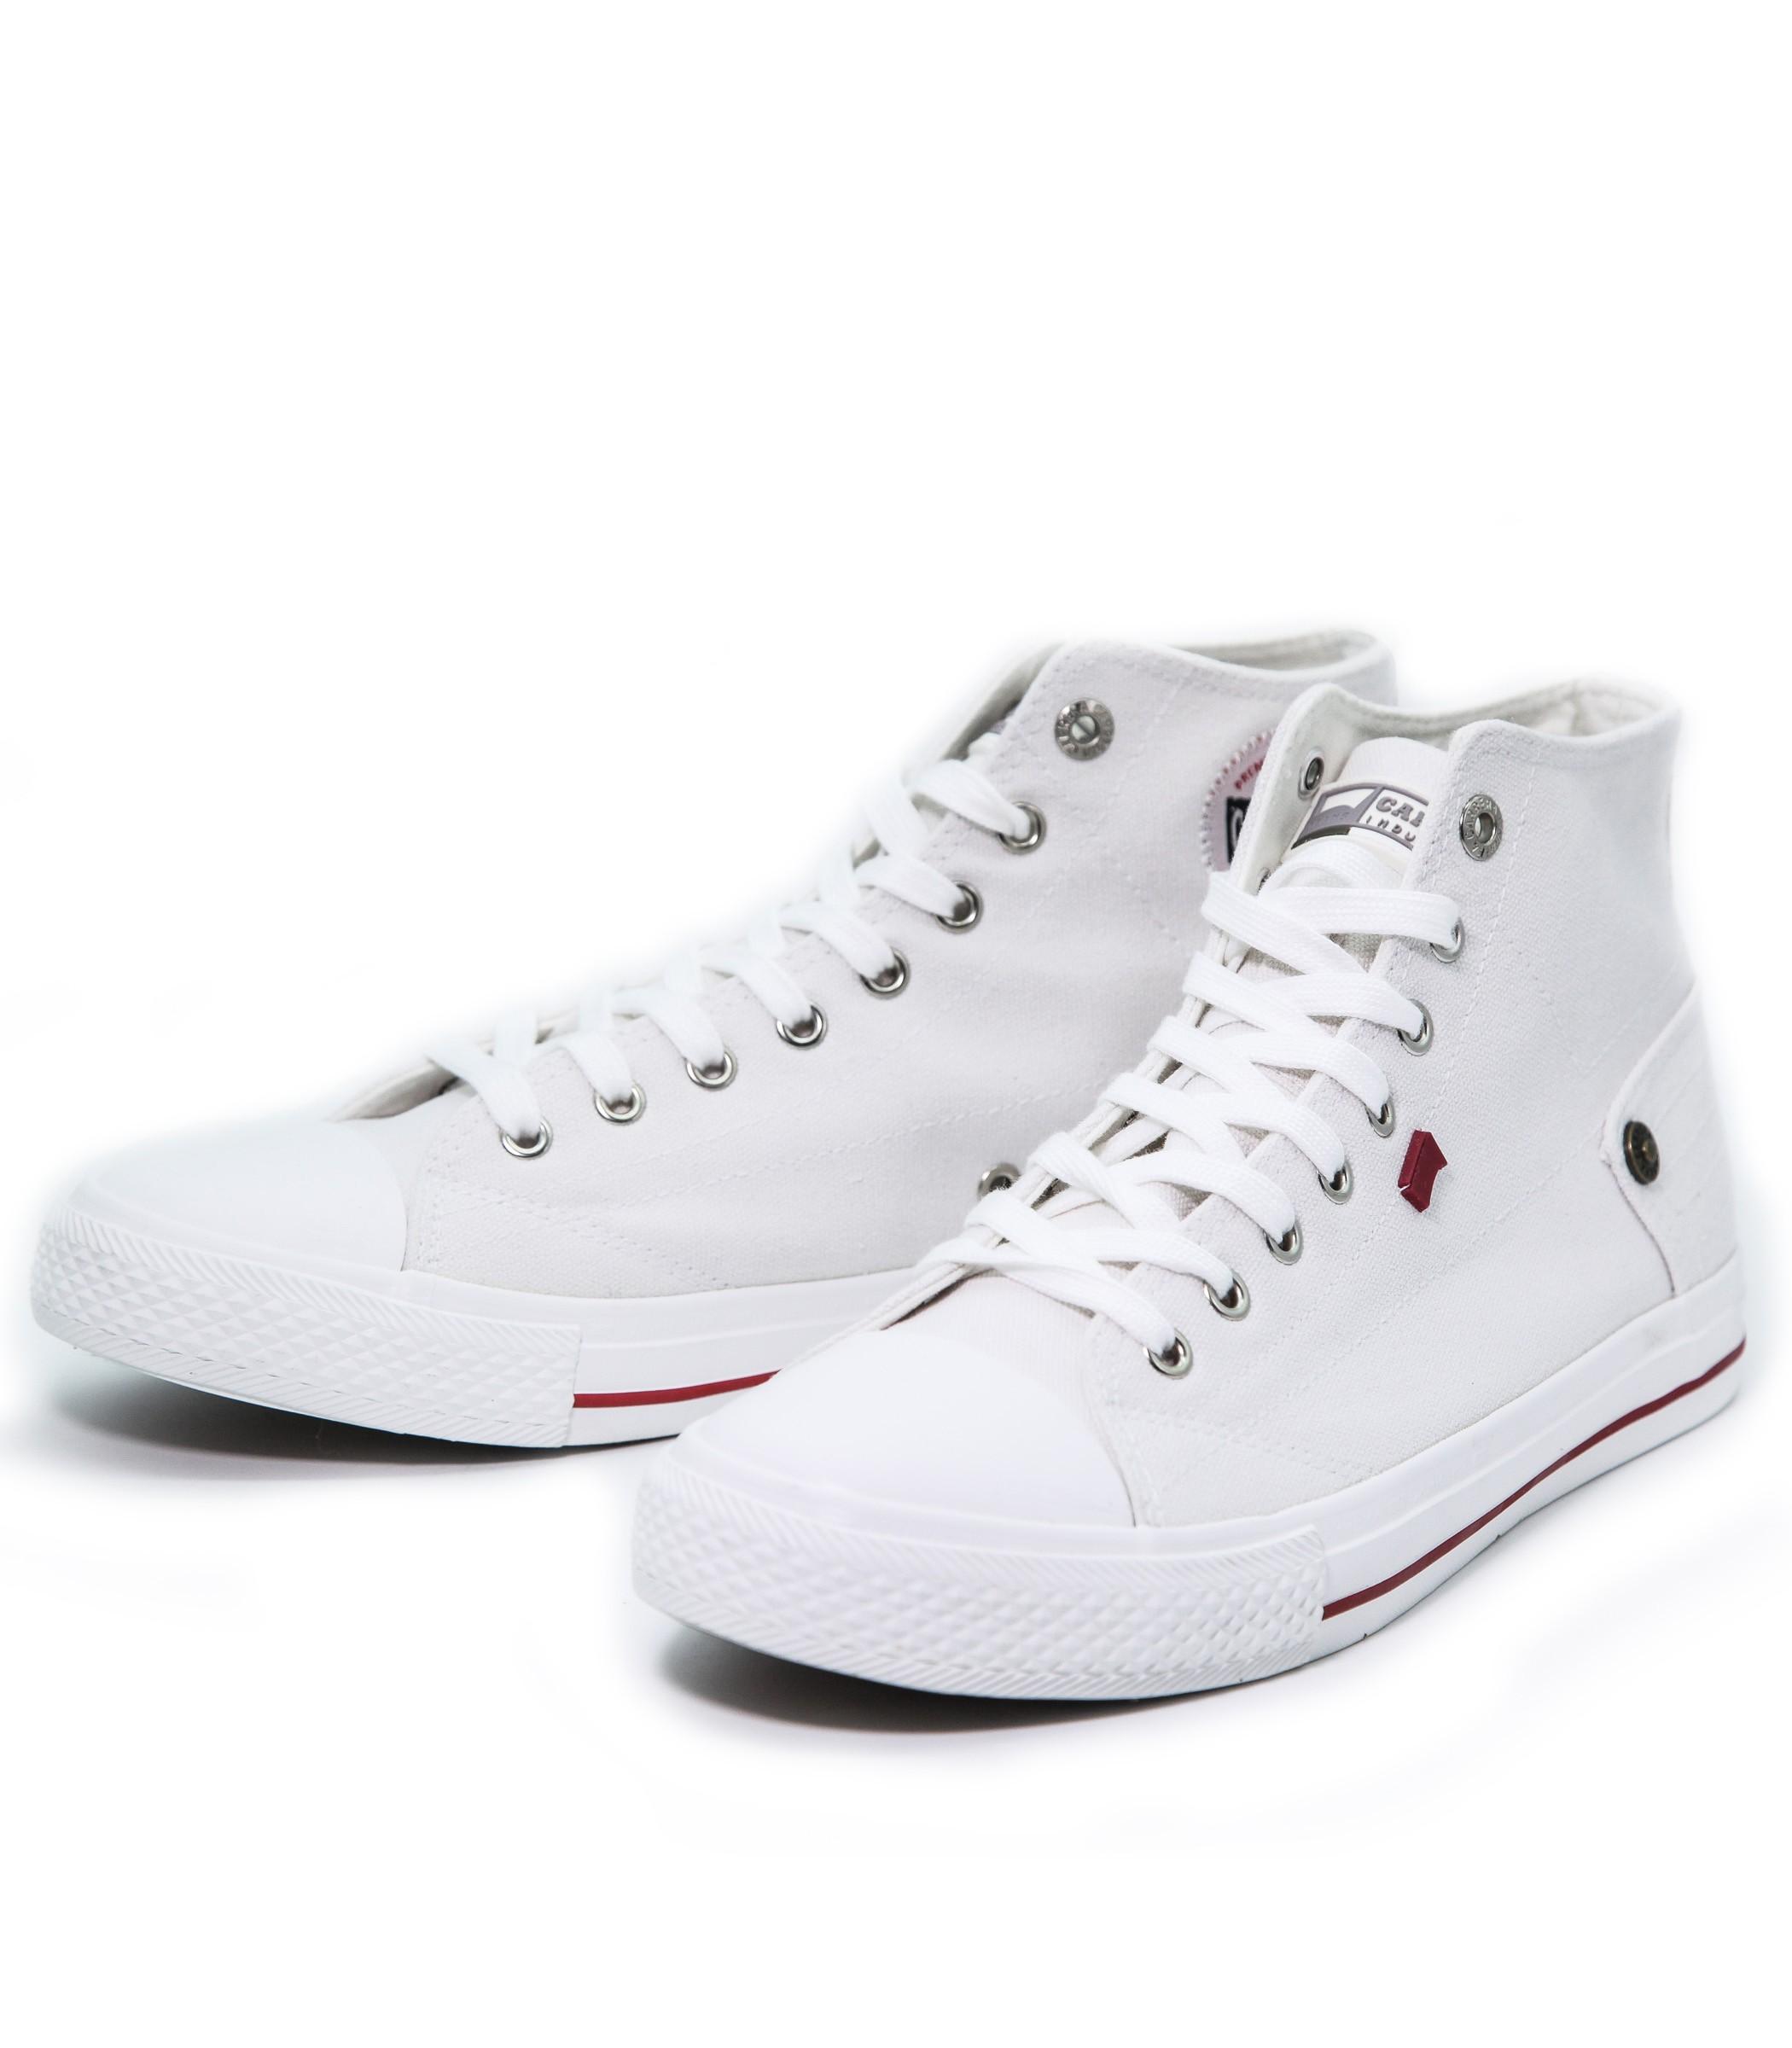 131265738c598 Scarpe Sneakers